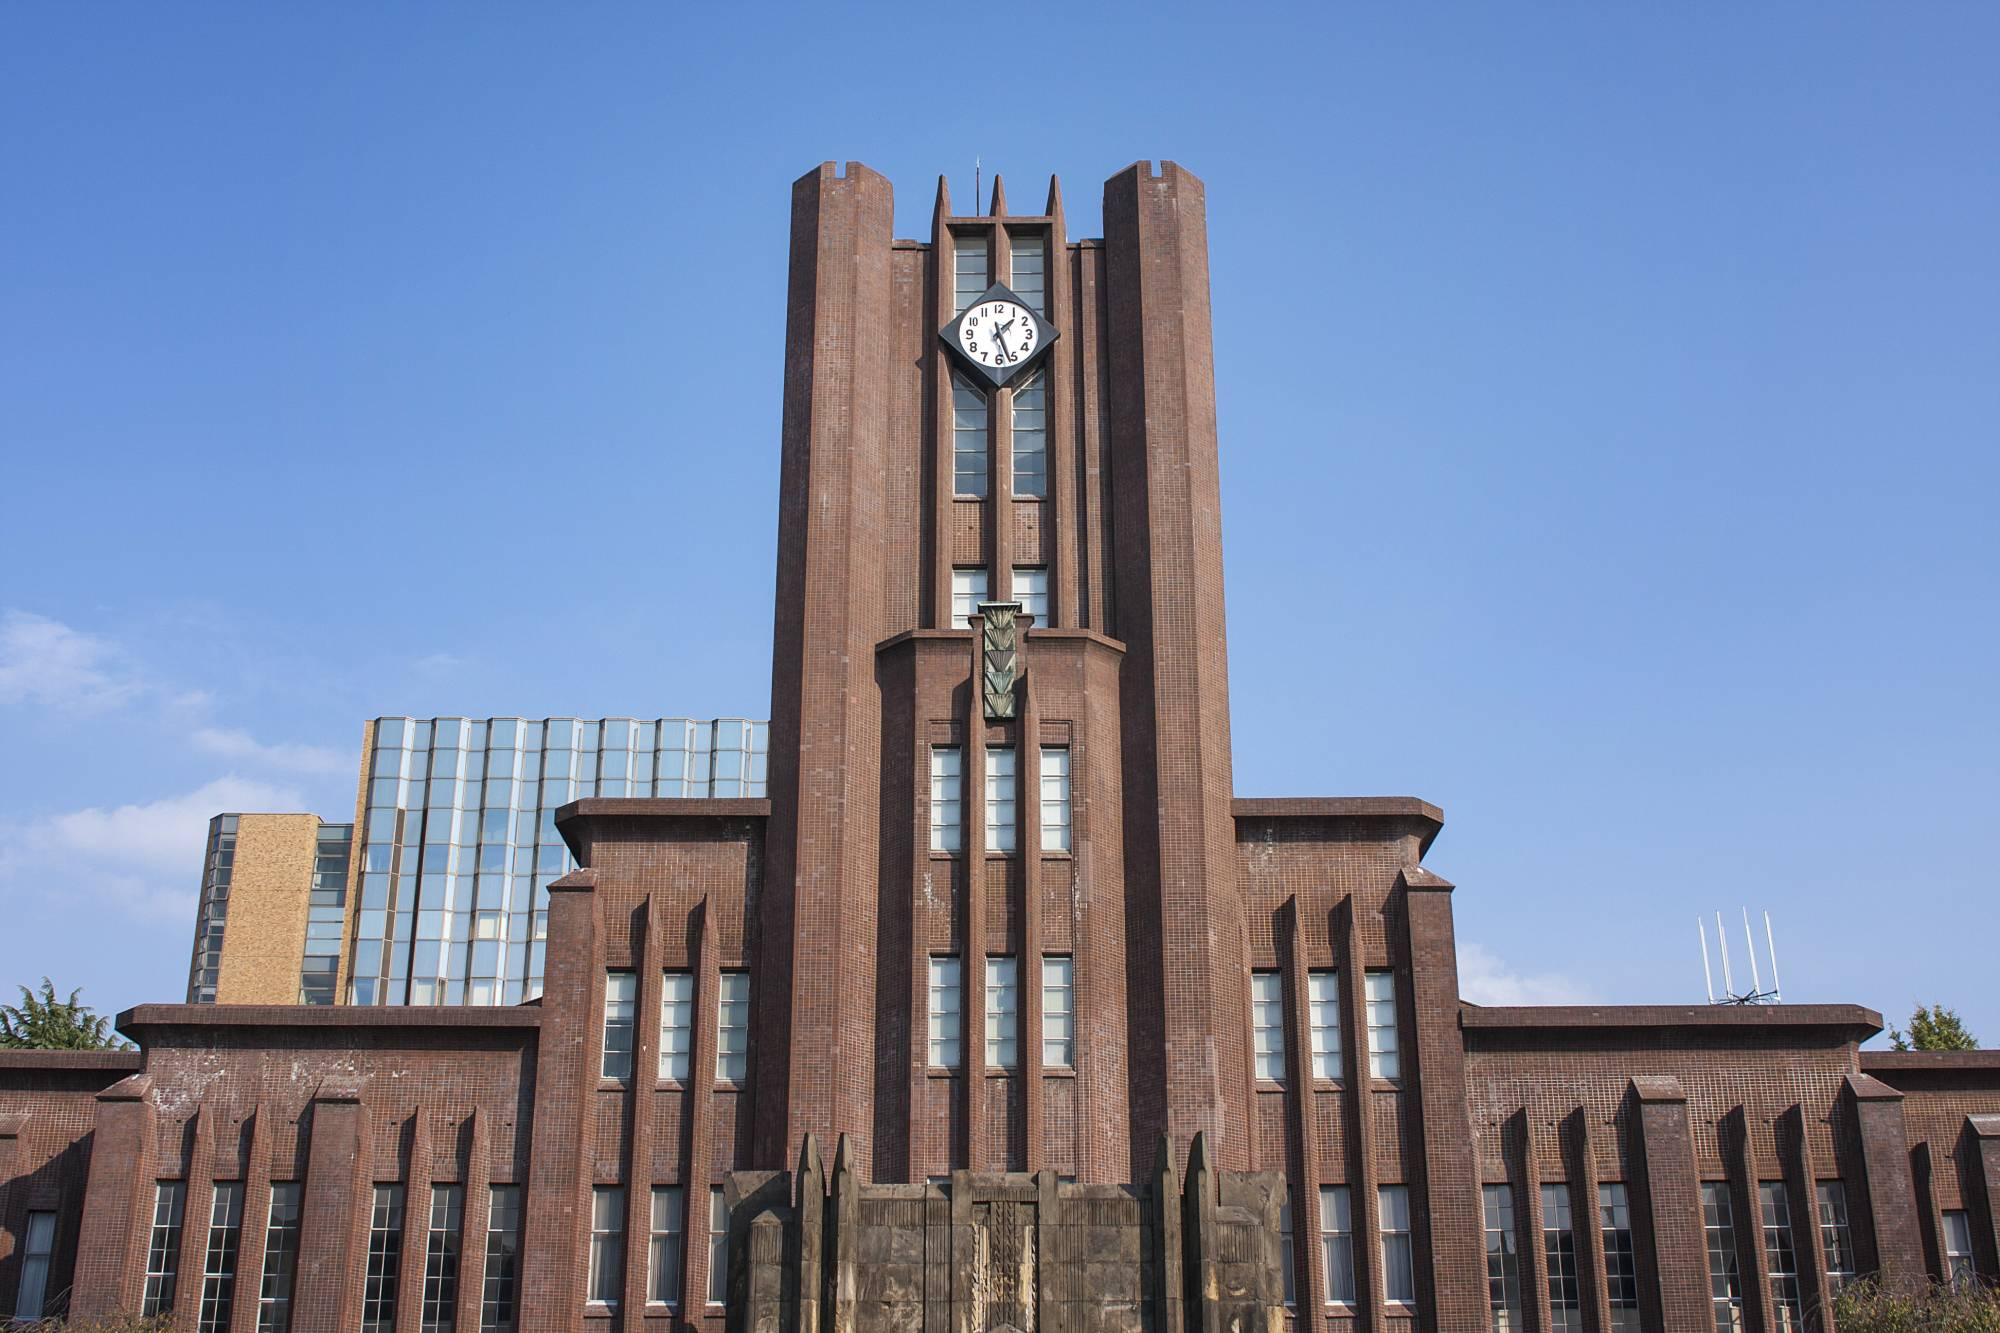 University of Tokyo Auditorium